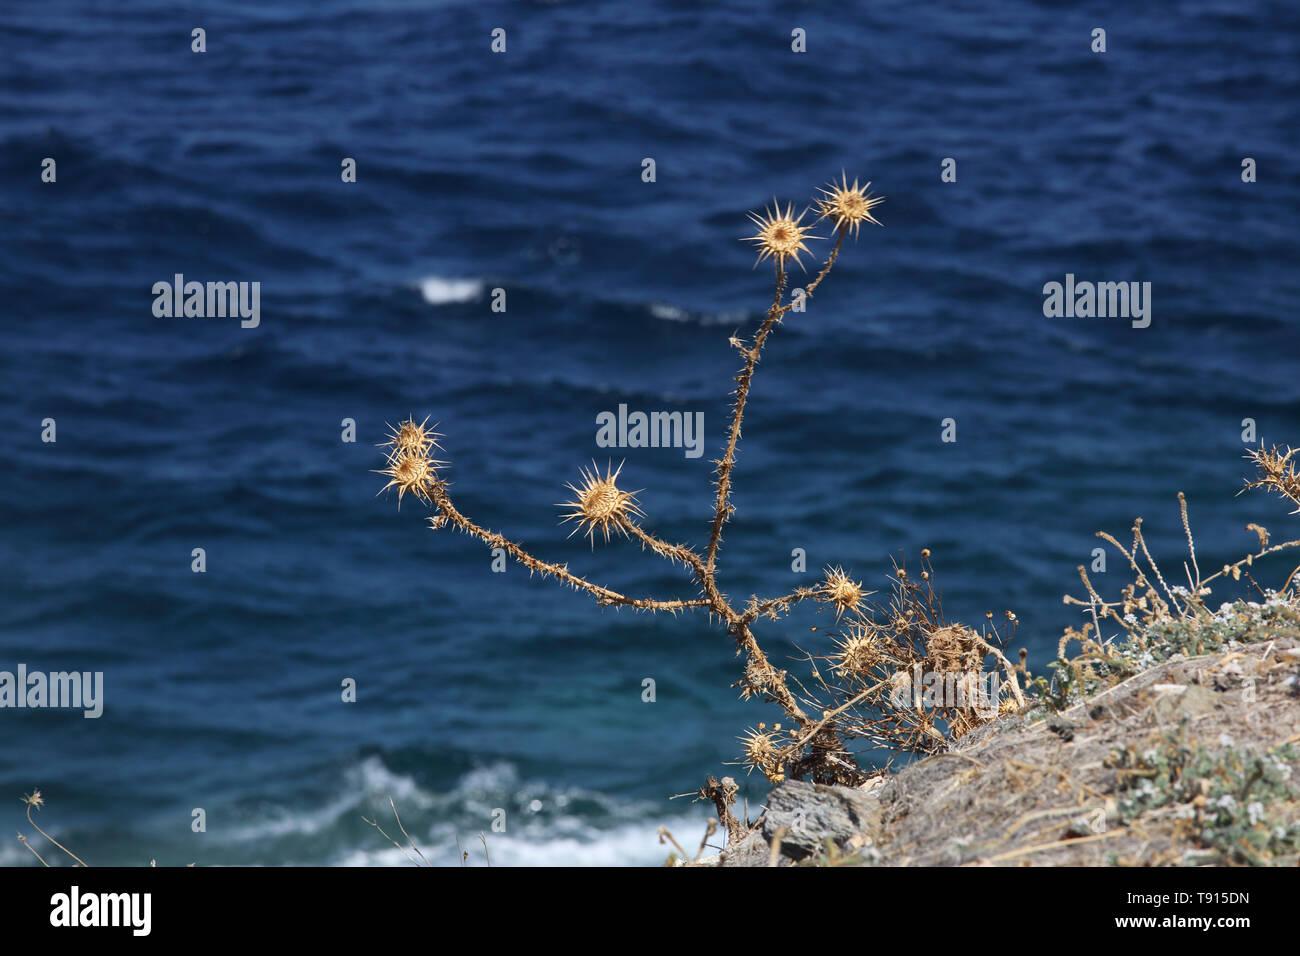 Port Korissia Kea Island Greece Dried Plants on Coastline - Stock Image